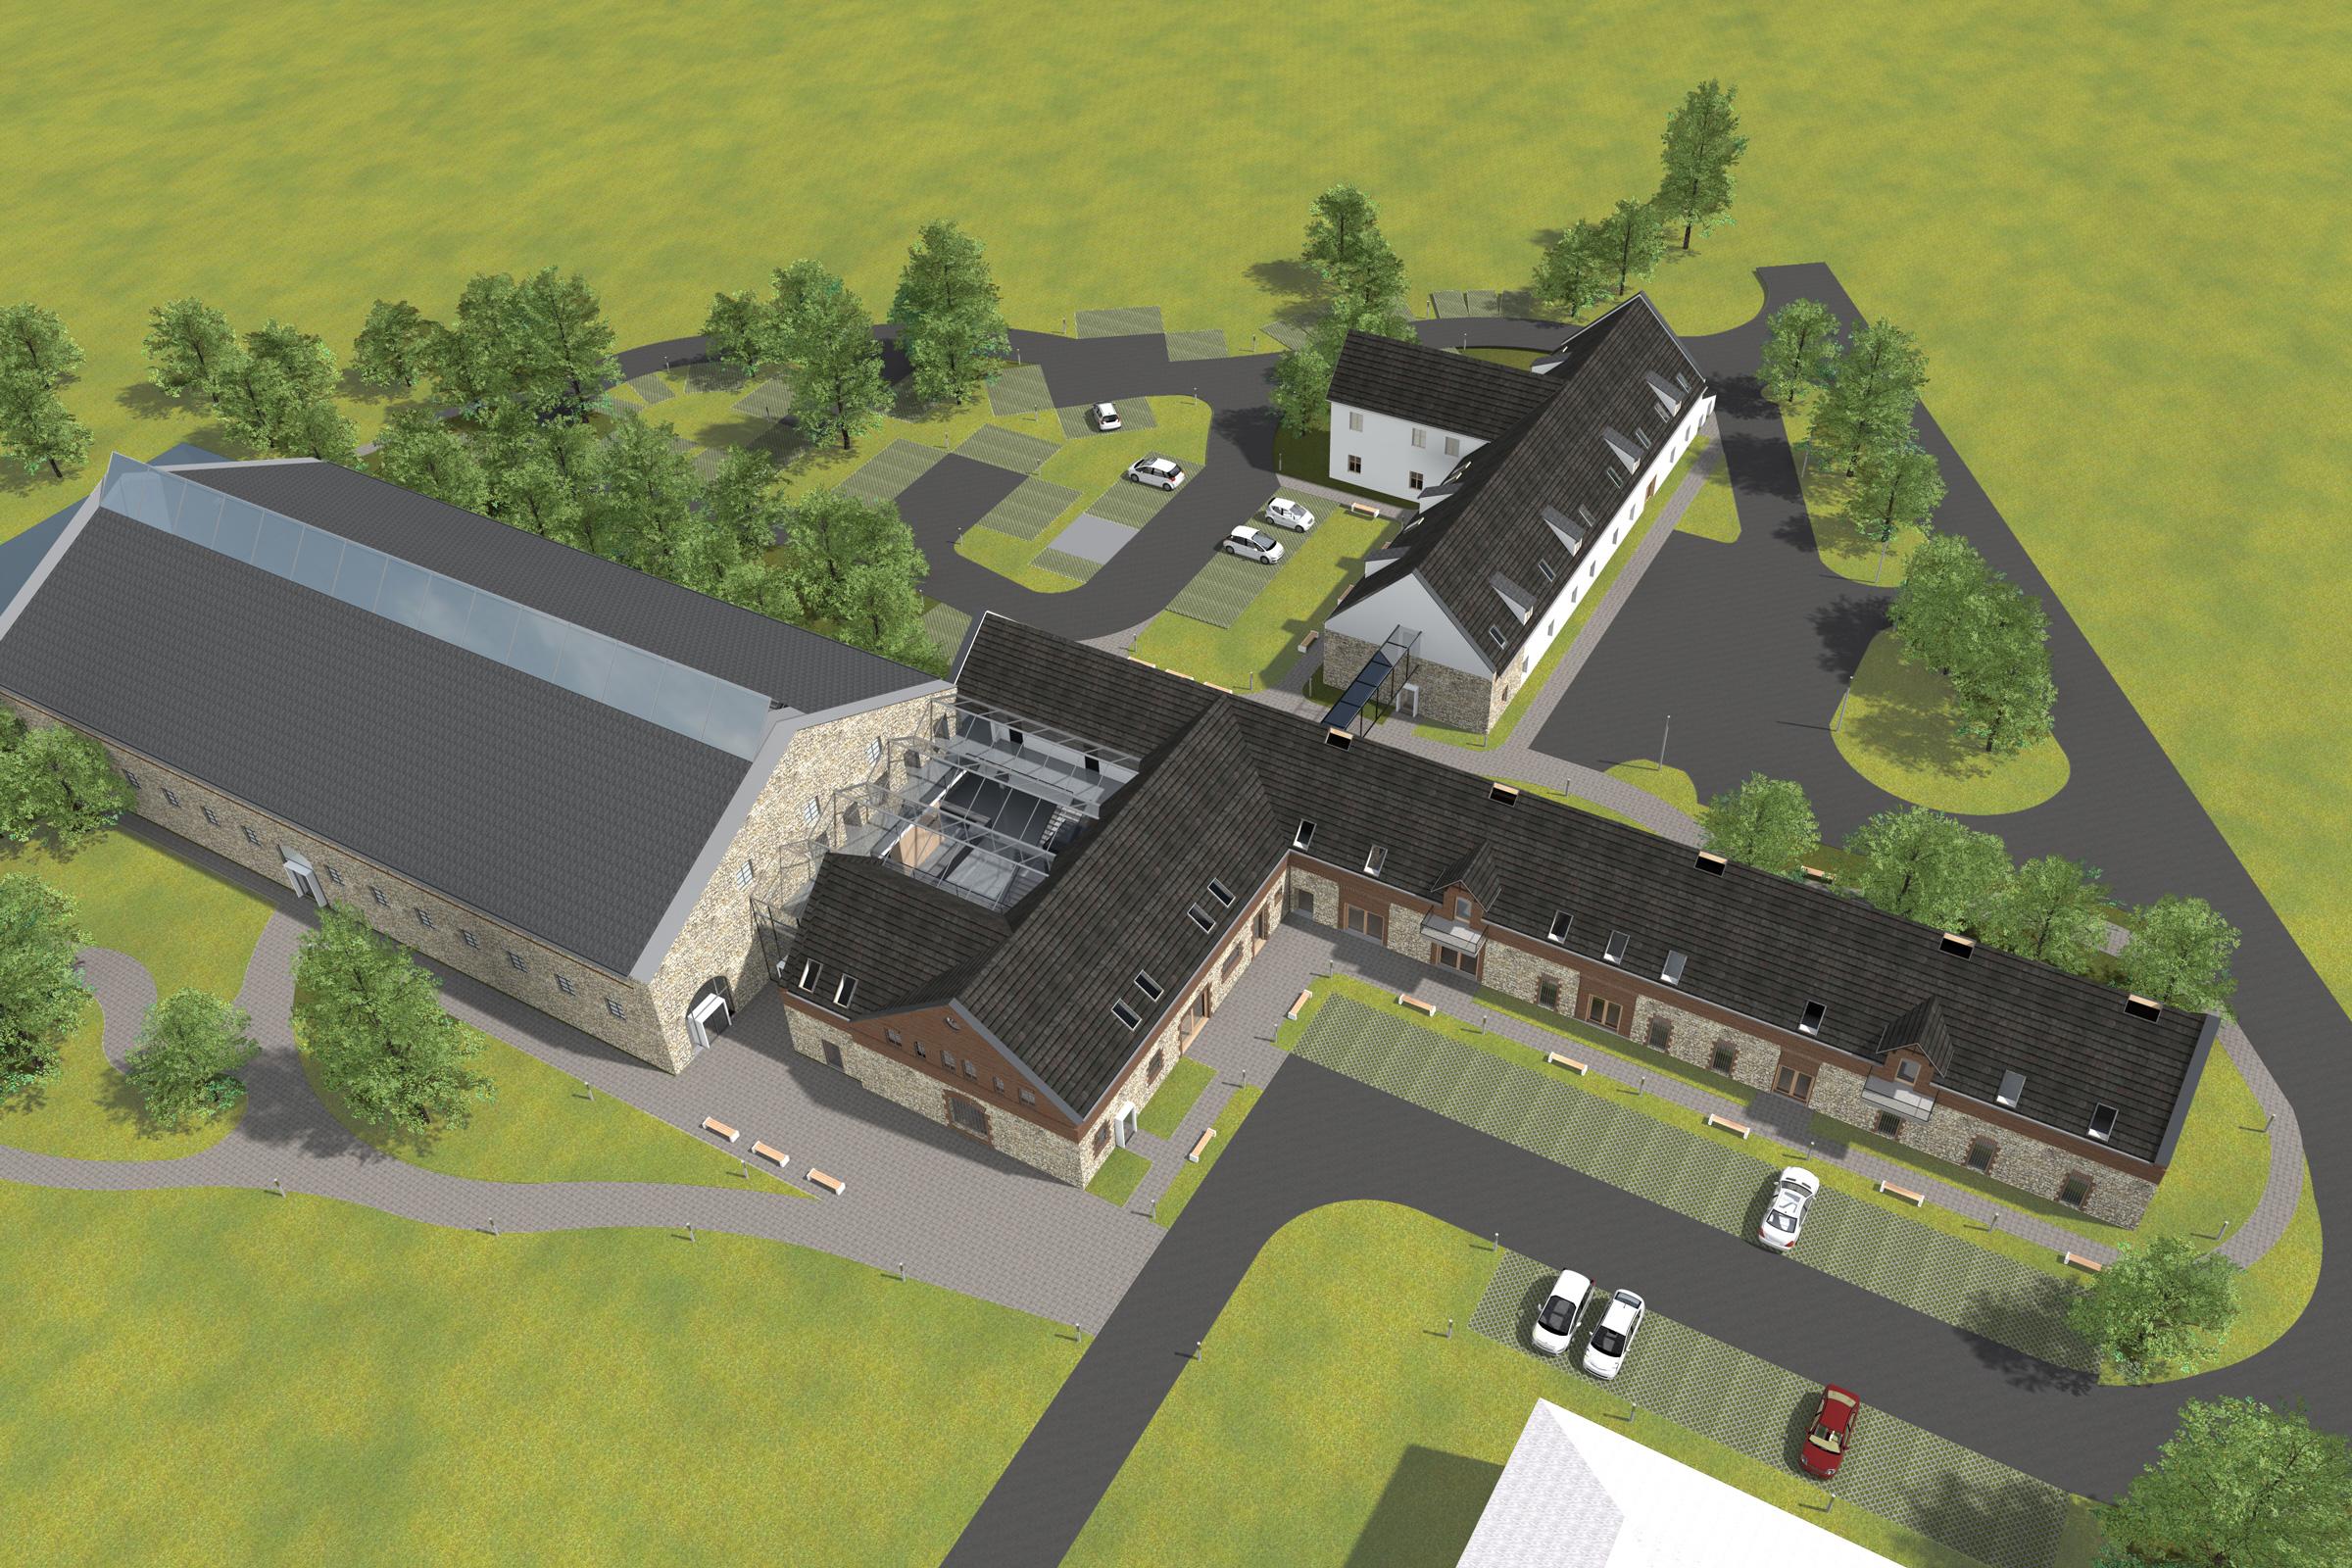 hotel, palac donnesmarckow, widok z lotu ptaka, architektura murator